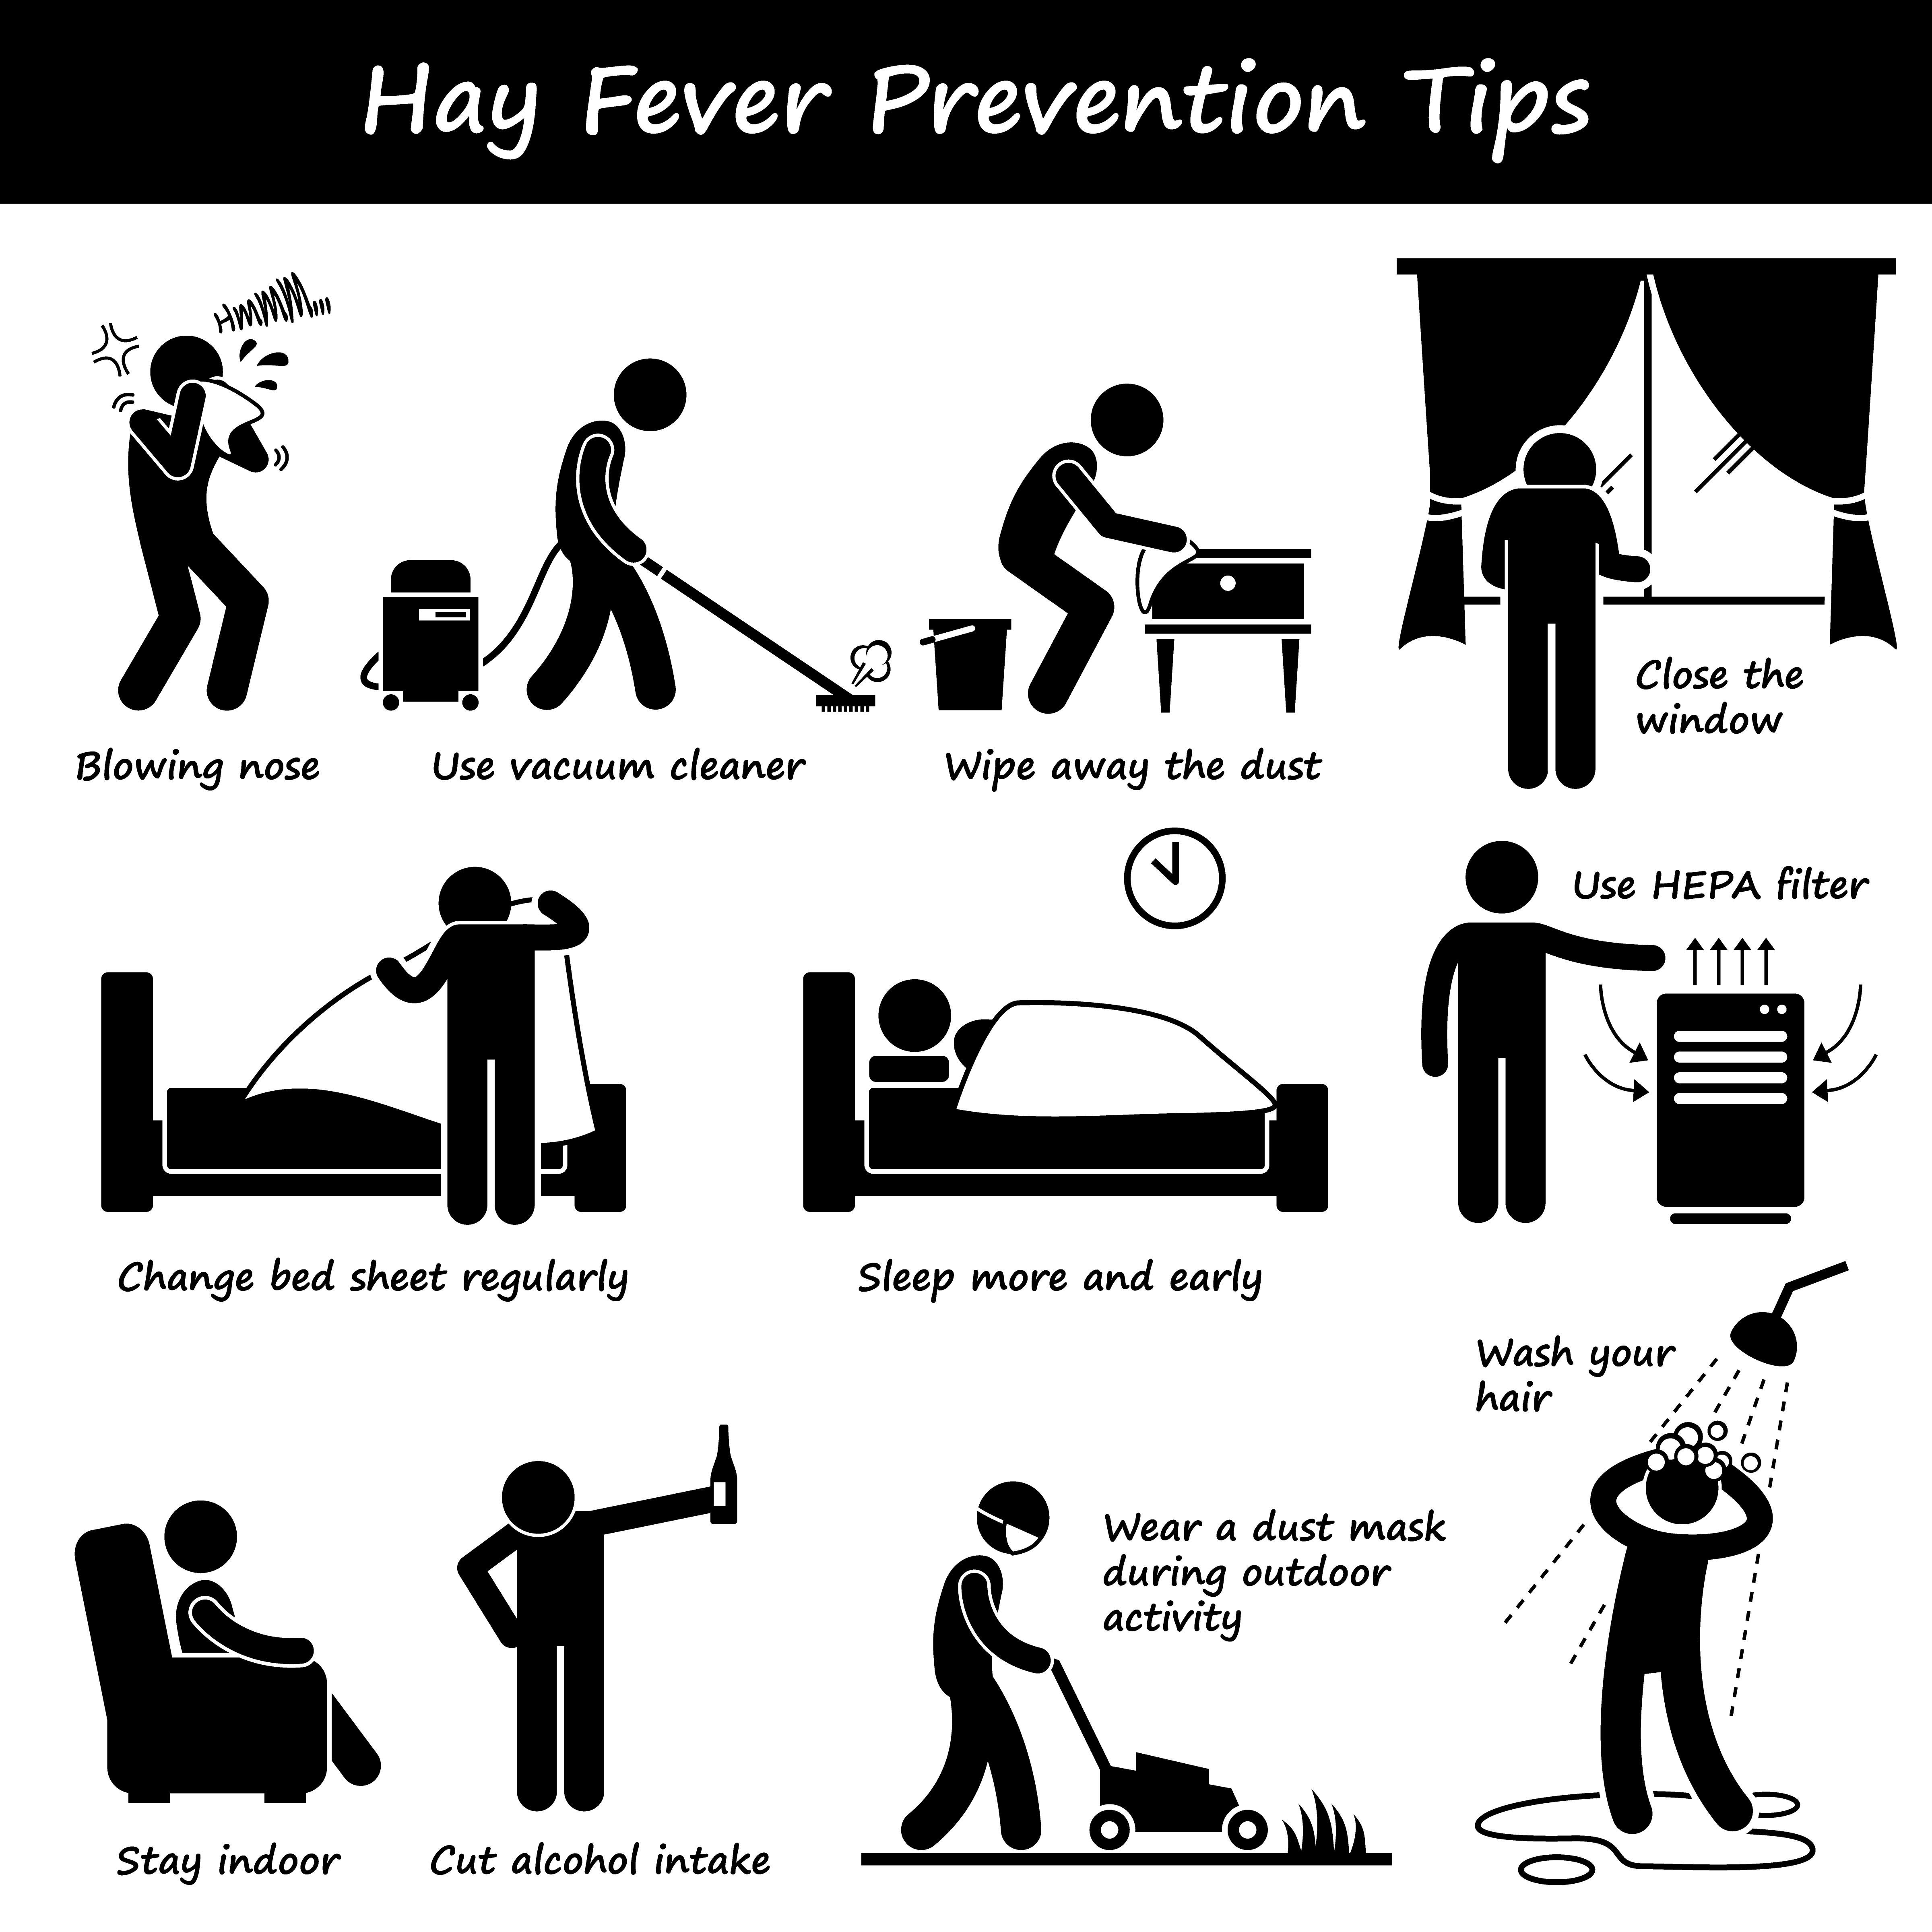 Hay Fever Prevention Allergy Tips Stick Figure Pictogram